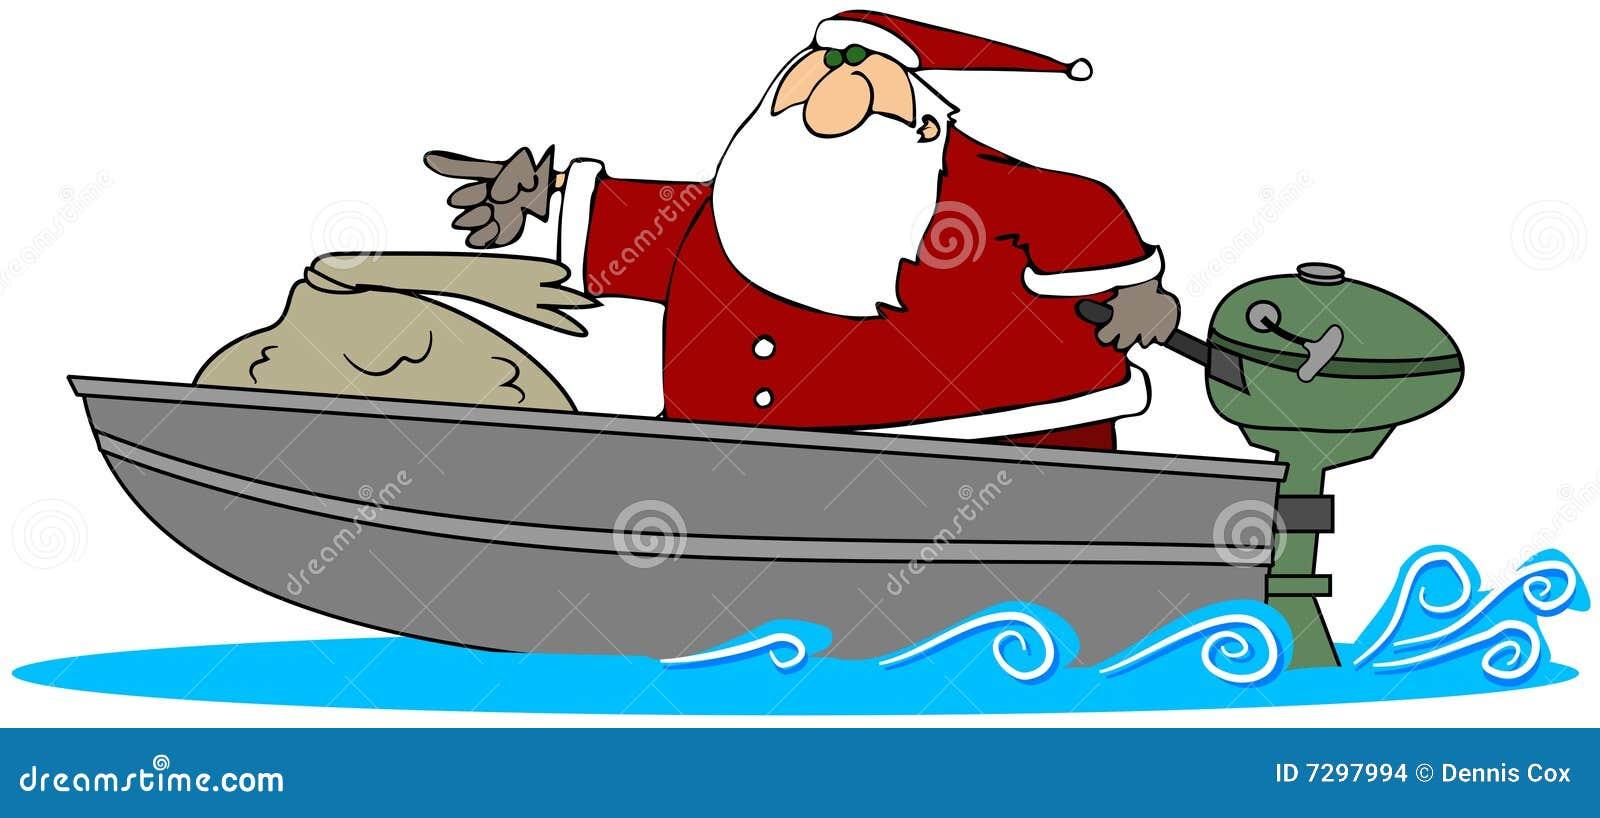 Cartoon Outboard Motors : Santa in a motor boat stock illustration image of